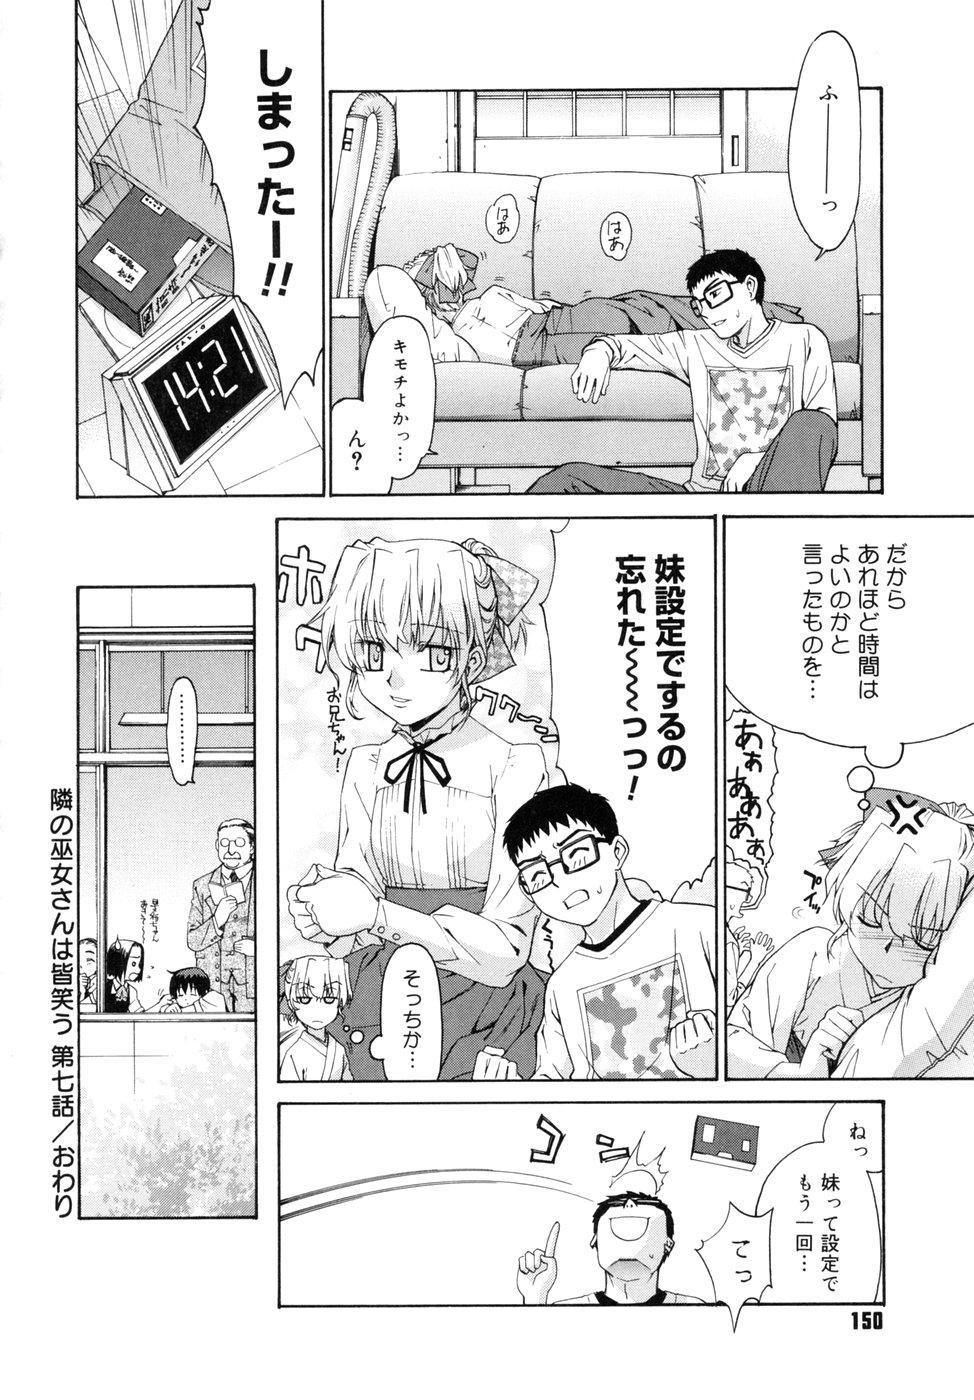 [Yaya Hinata] Tonari no Miko-san wa Minna Warau - The next shrine maidens smile in everyone. 149